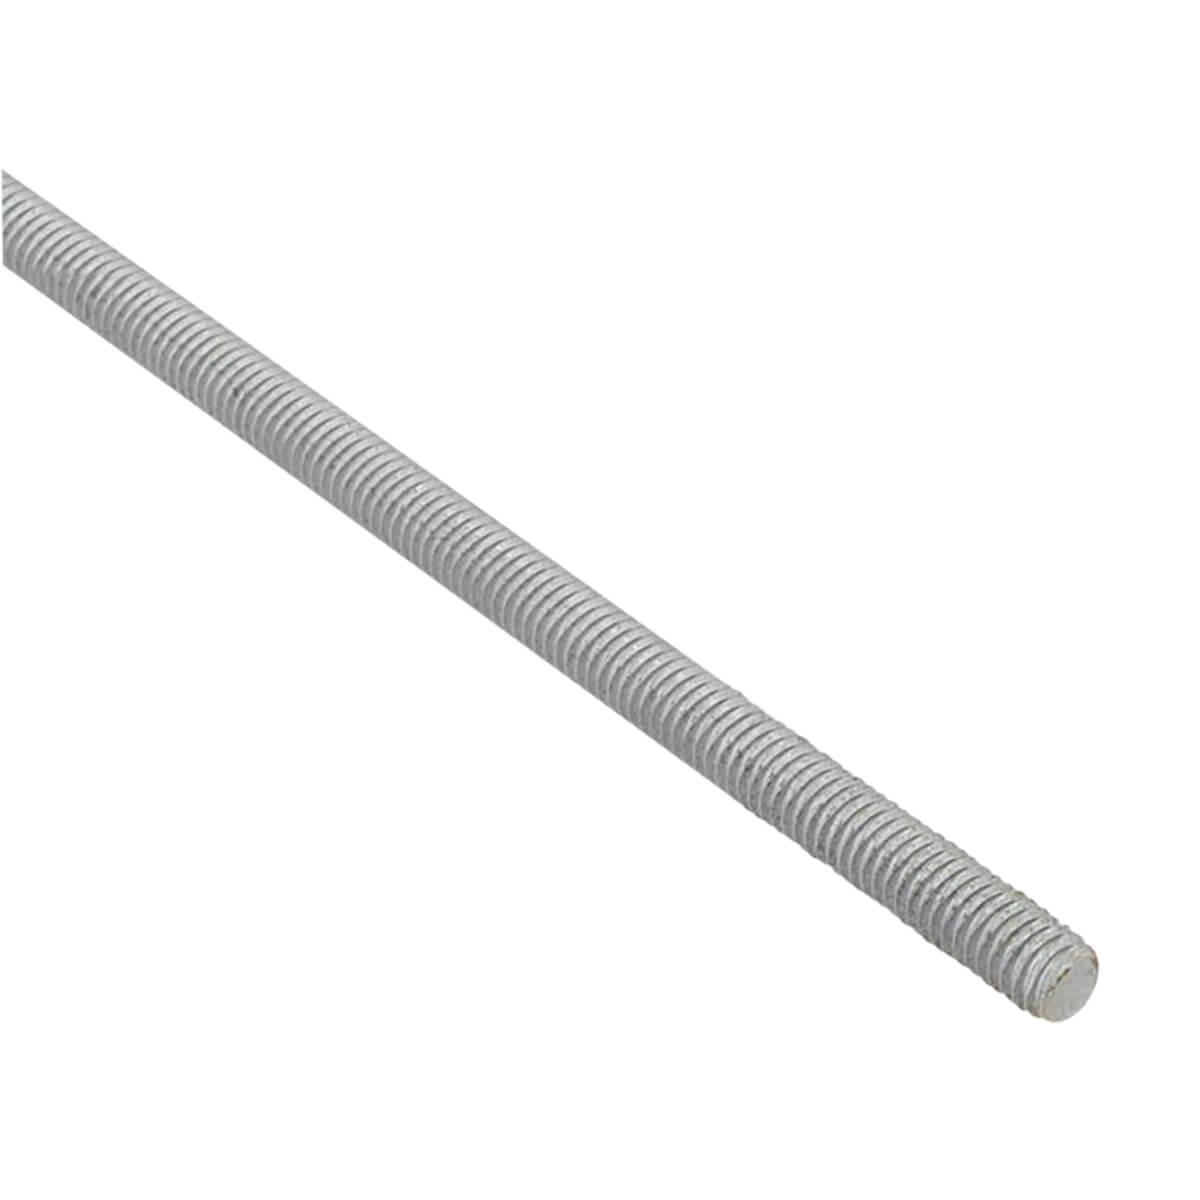 Threaded Rod - Green Tip - 10-24 - 36-in